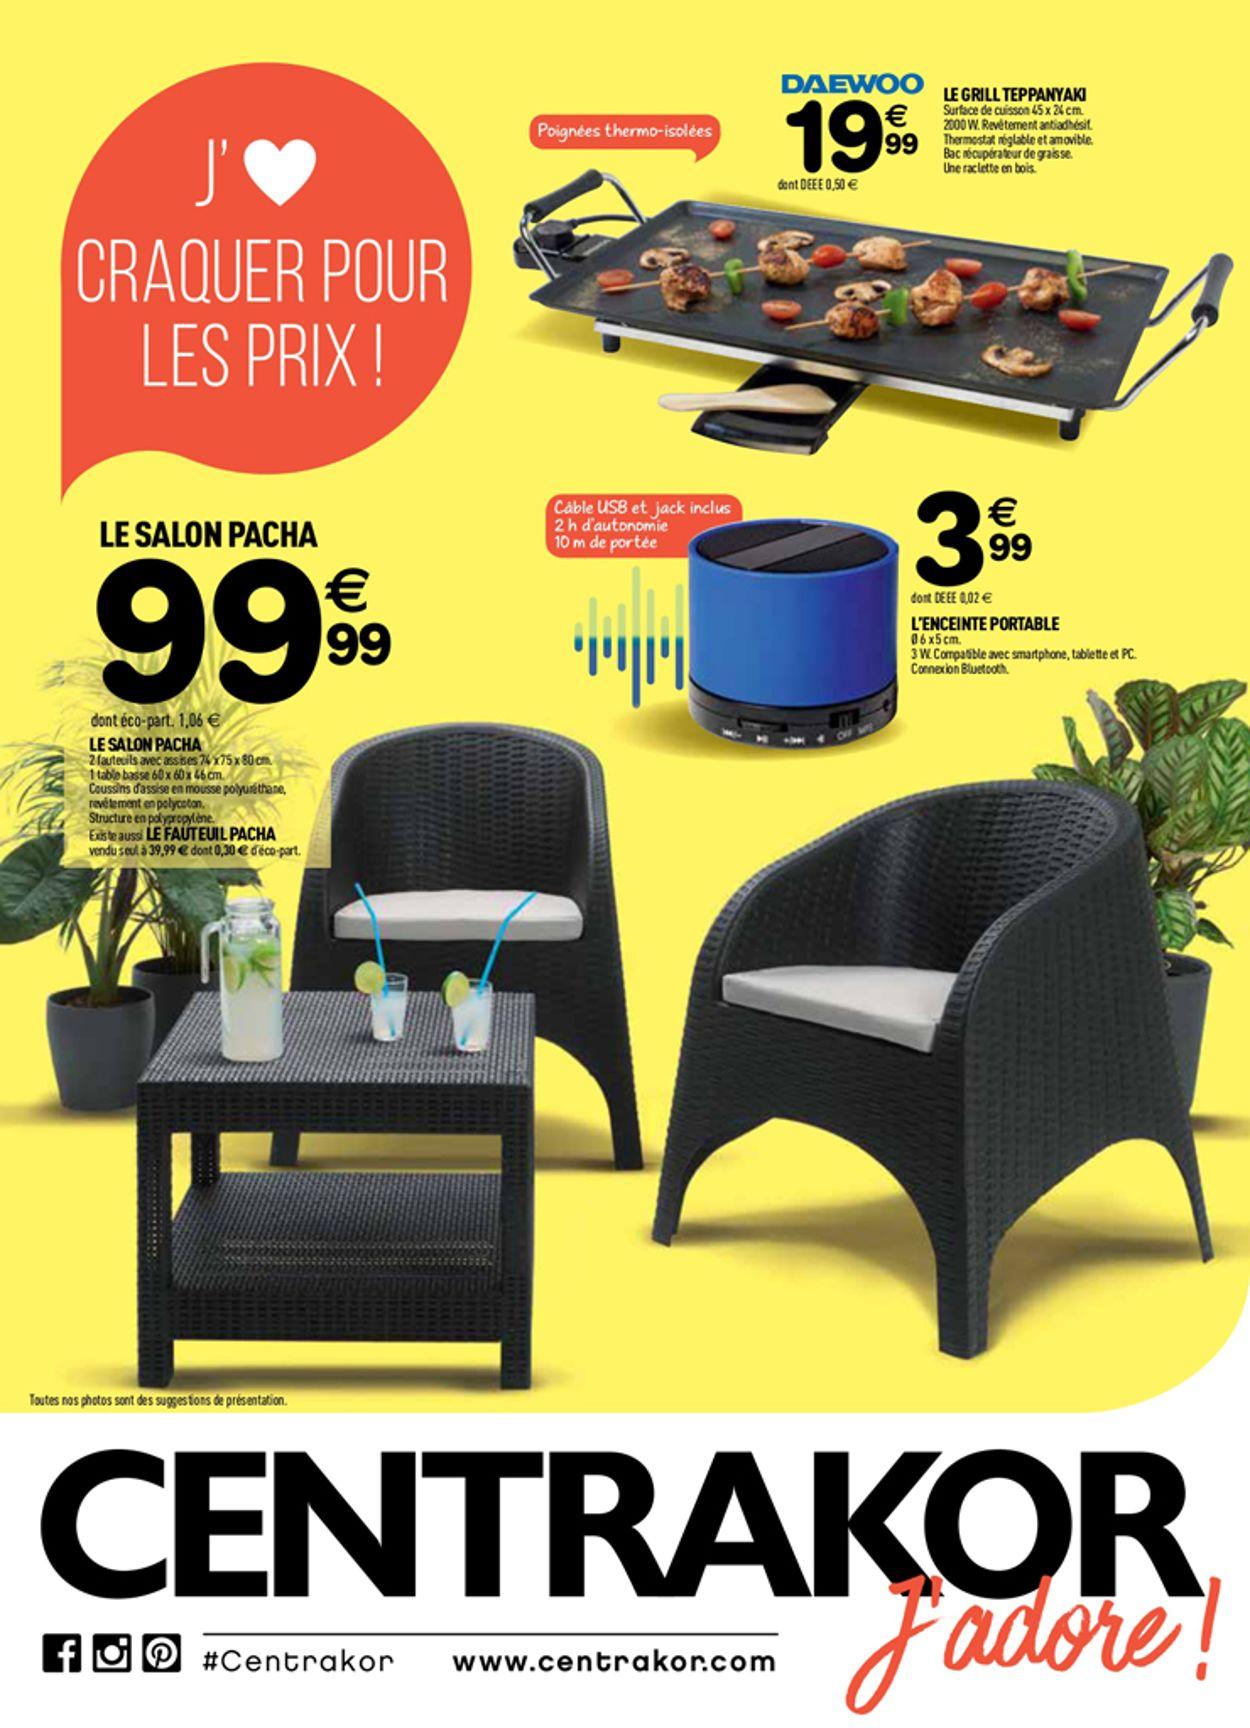 Centrakor Catalogue Actuel 01.07 - 14.07.2019 - Catalogue-24 intérieur Salon De Jardin Centrakor 2019